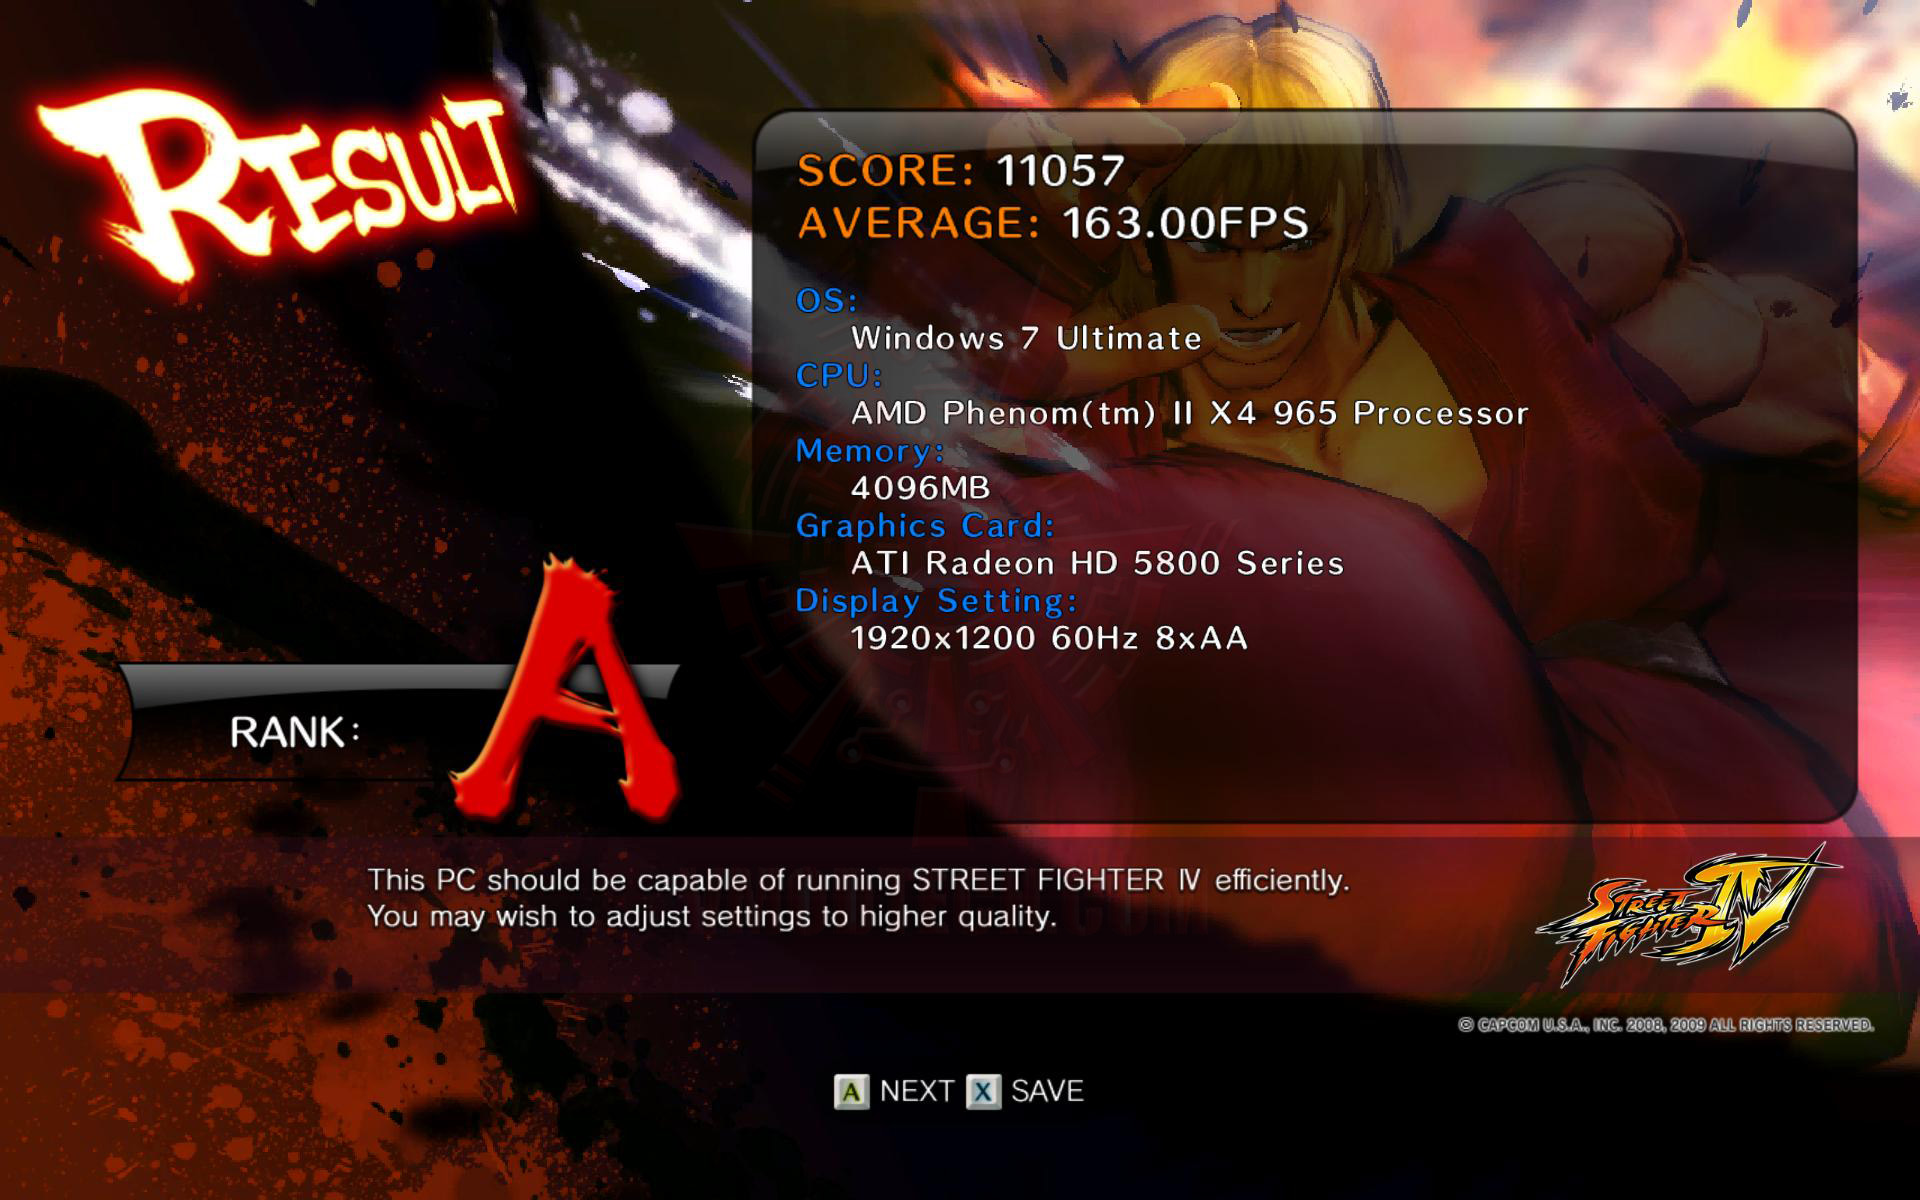 sf4 AMD Phenom II X6 1090T & Leo Platform : For Mega tasking performance !